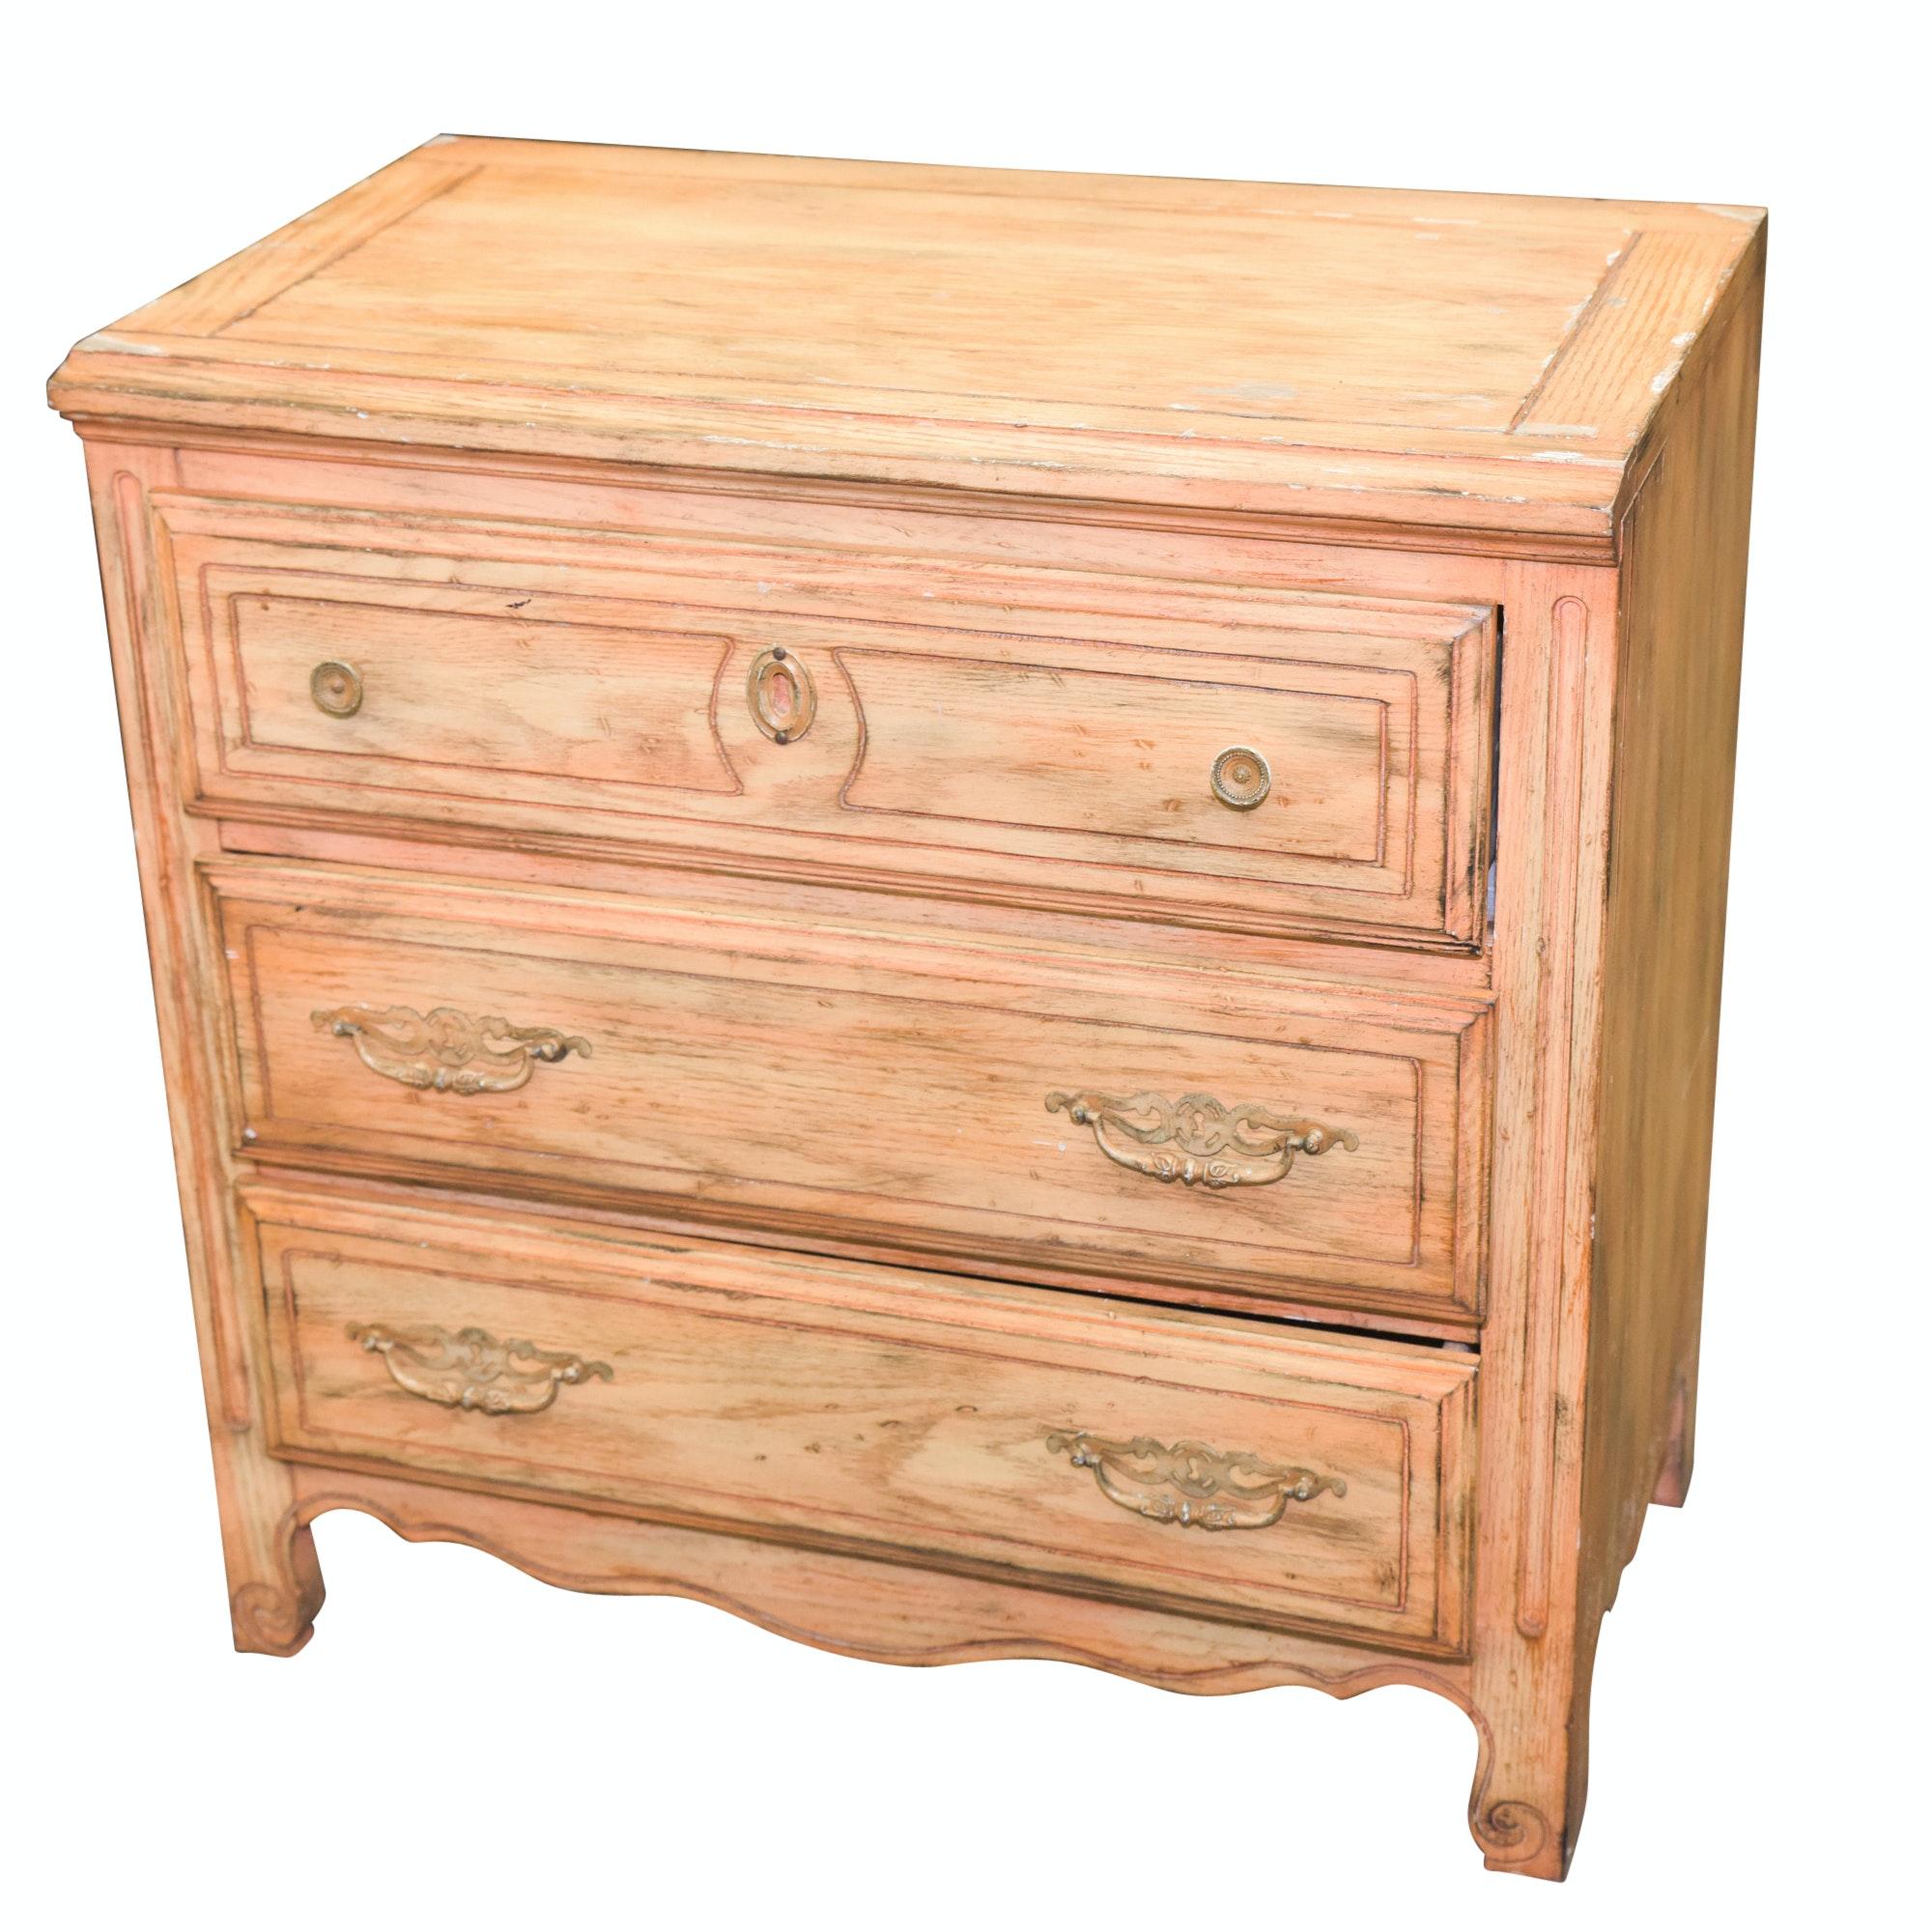 Chest of Drawers by Appalachian Oak